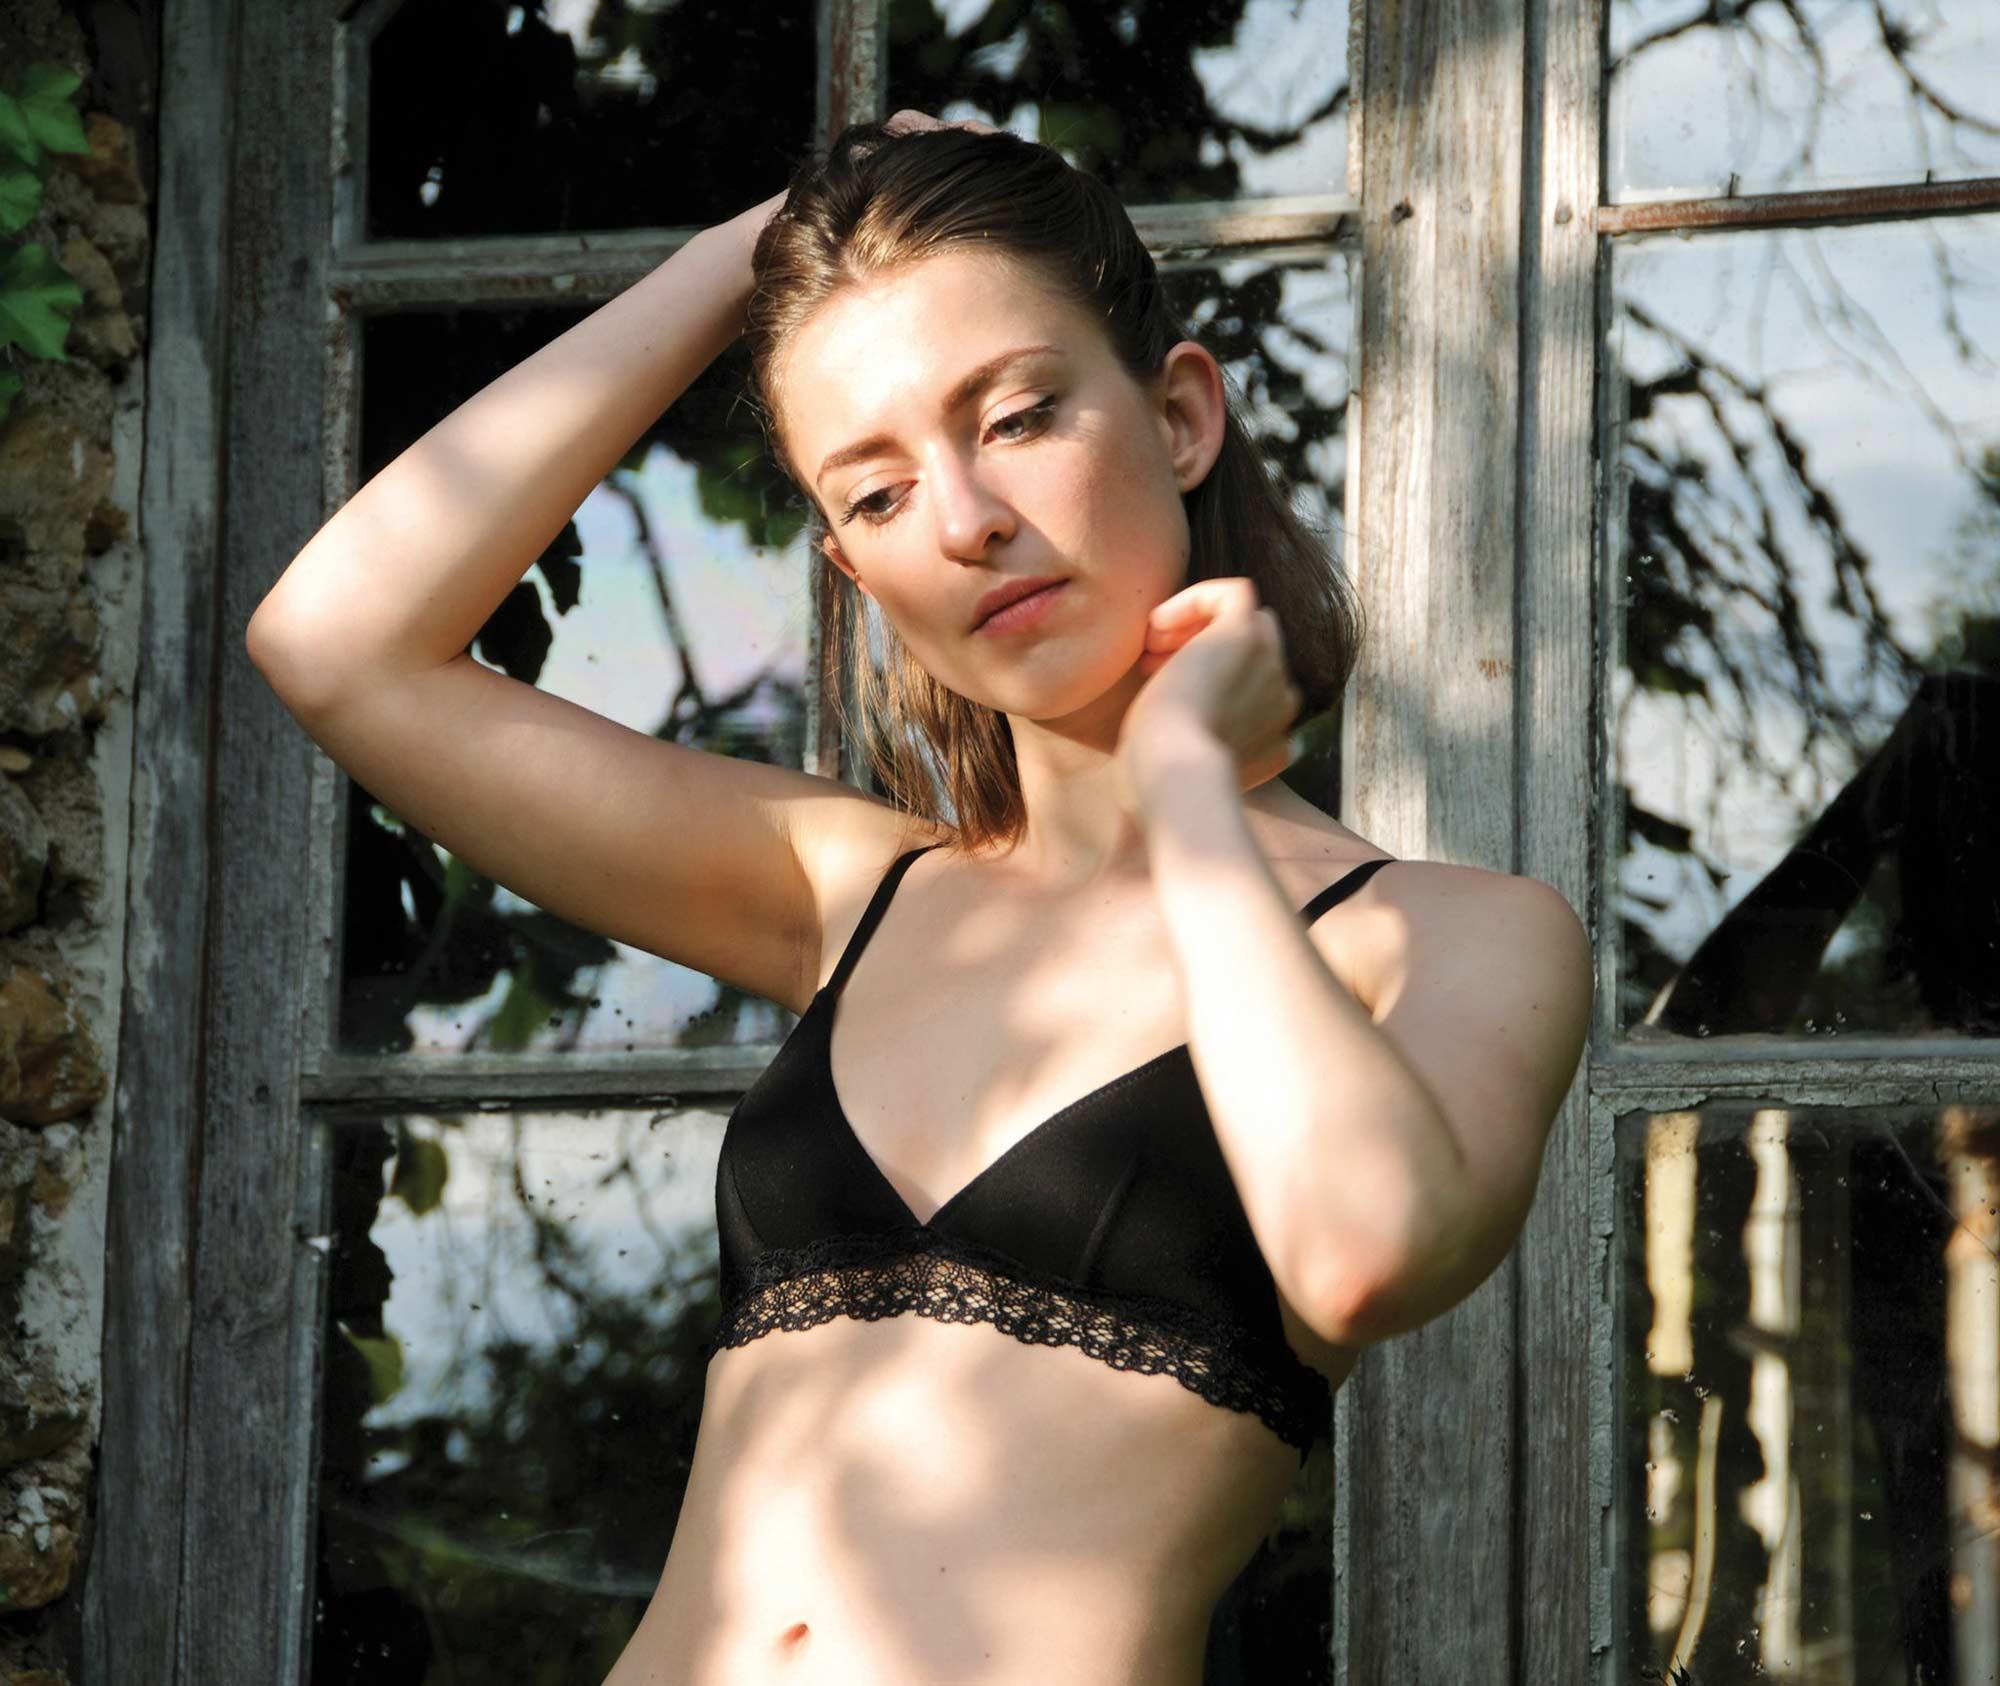 Blognroll La Lingerie De Taille • Luxe Sexy Grande WDIE2H9